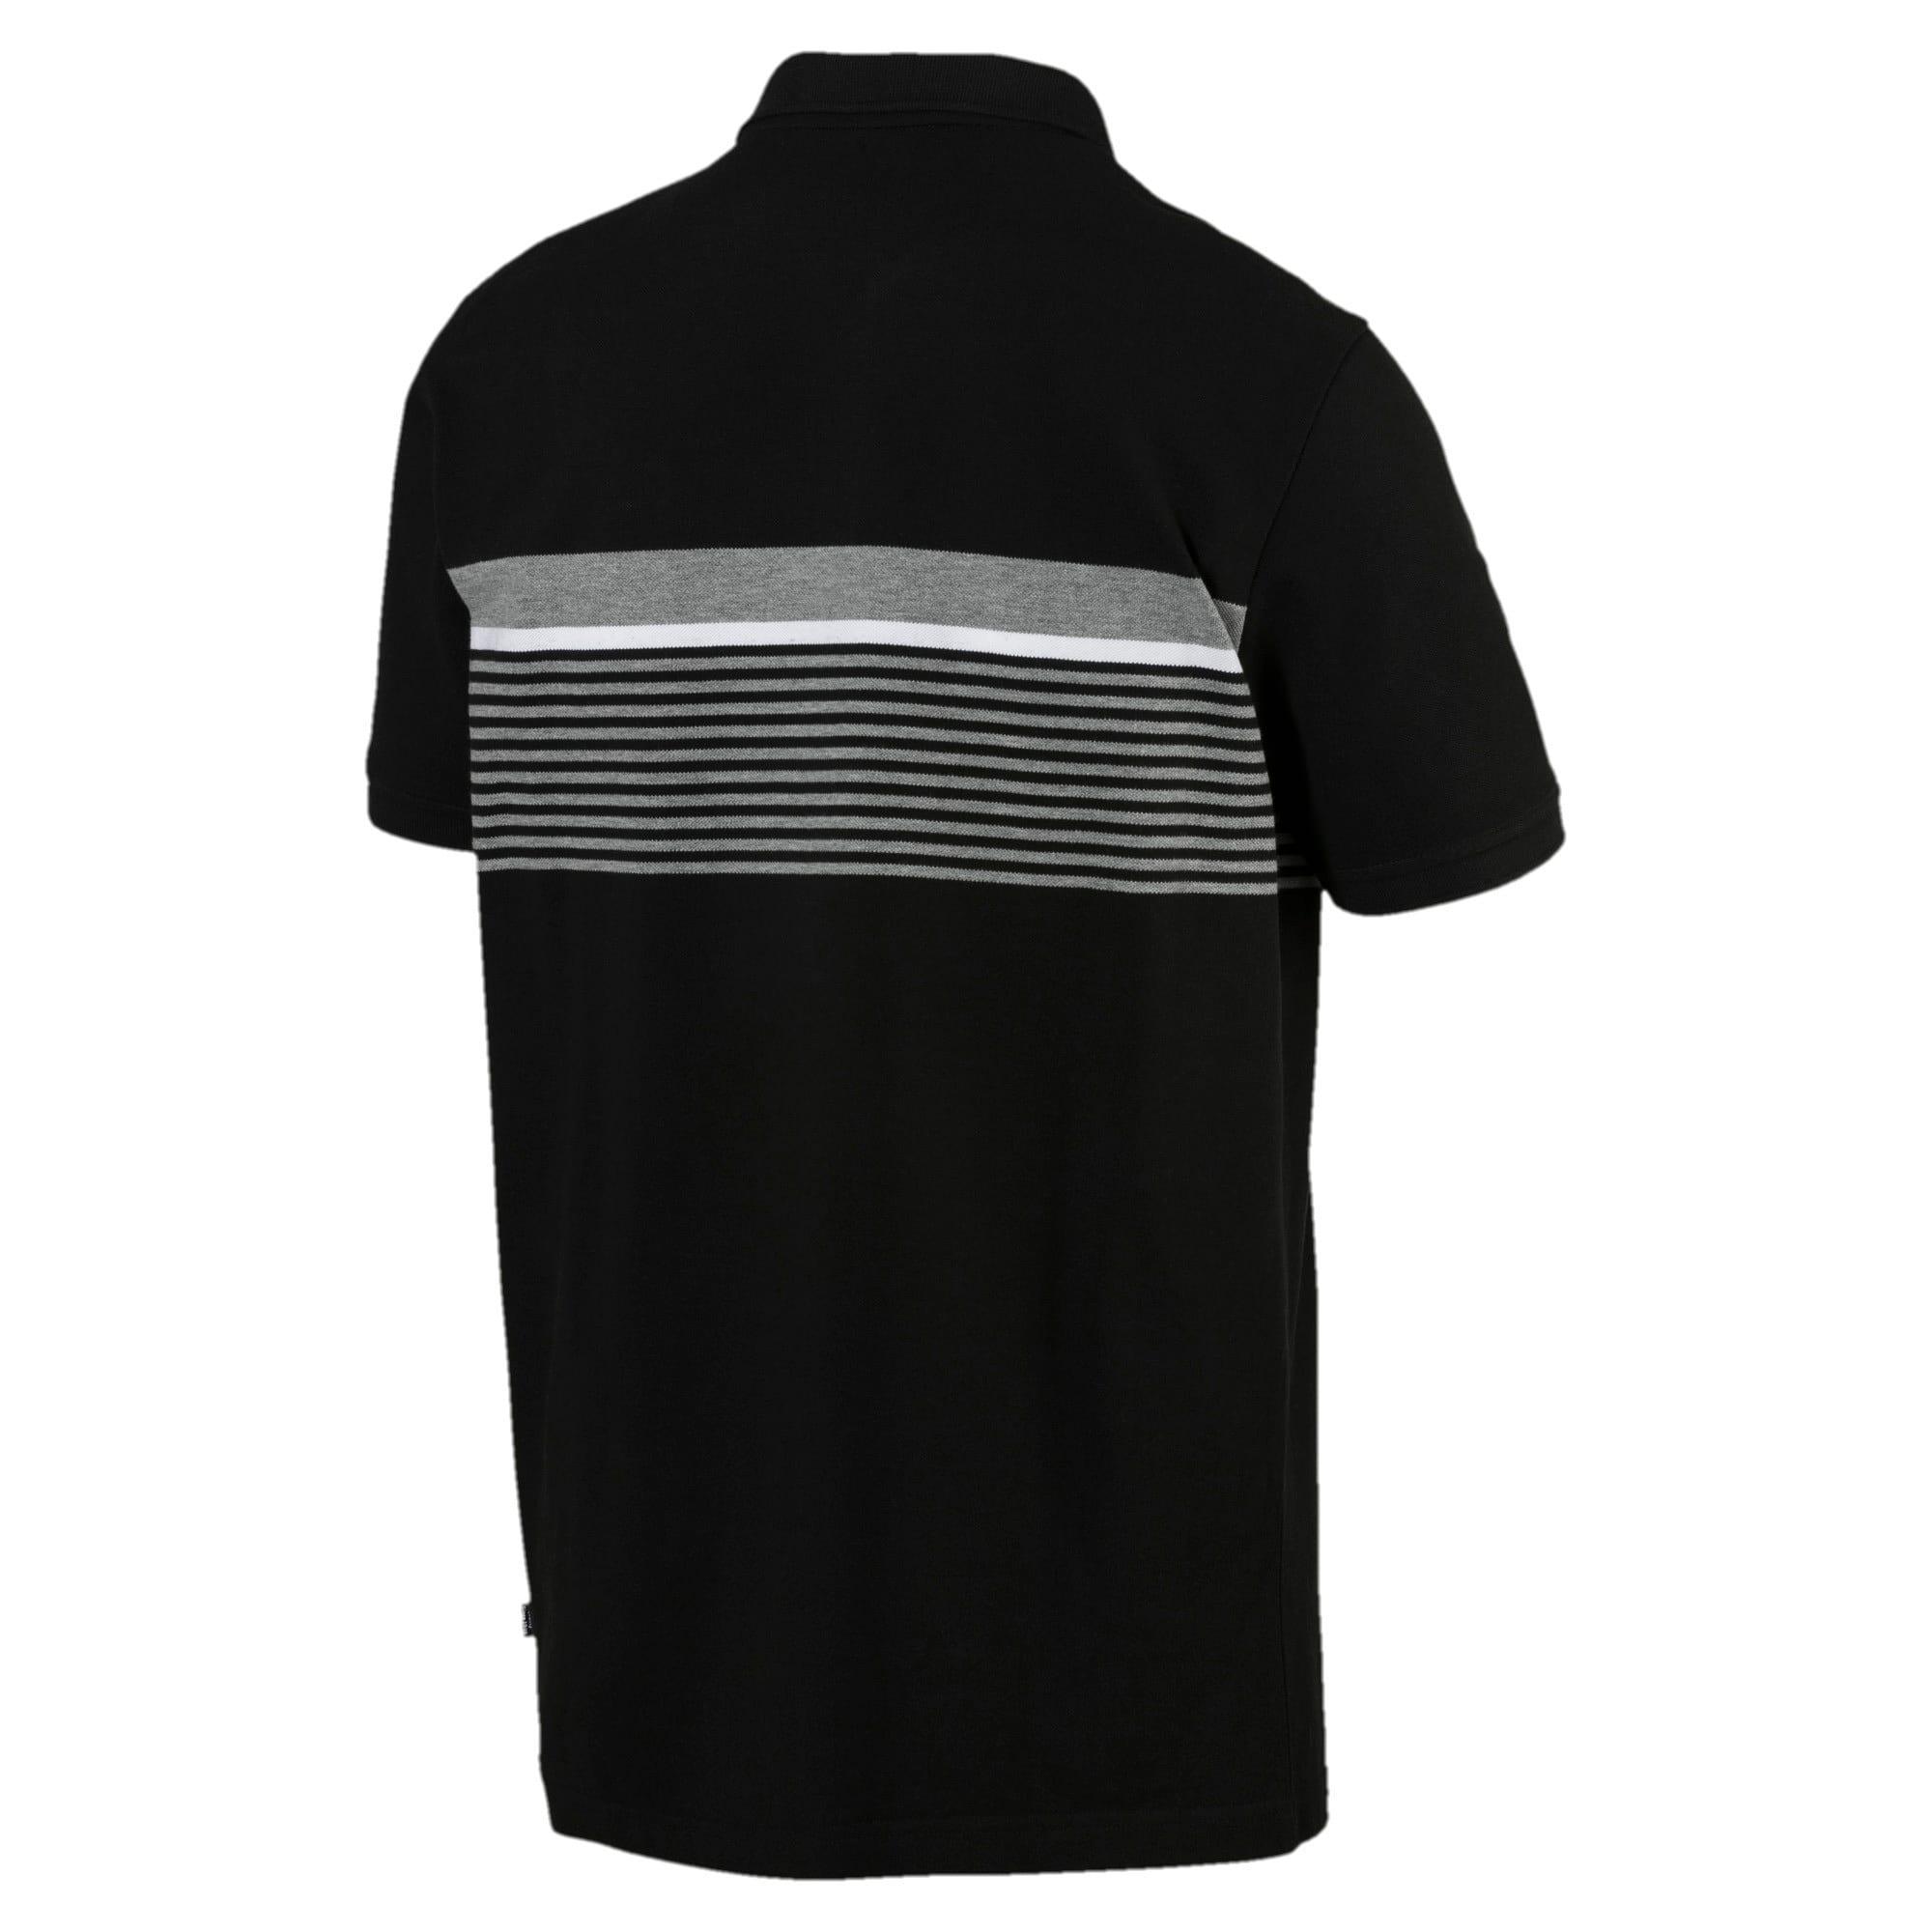 Miniatura 3 de Camiseta tipo polo ESS+ Striped para hombre, Cotton Black, mediano